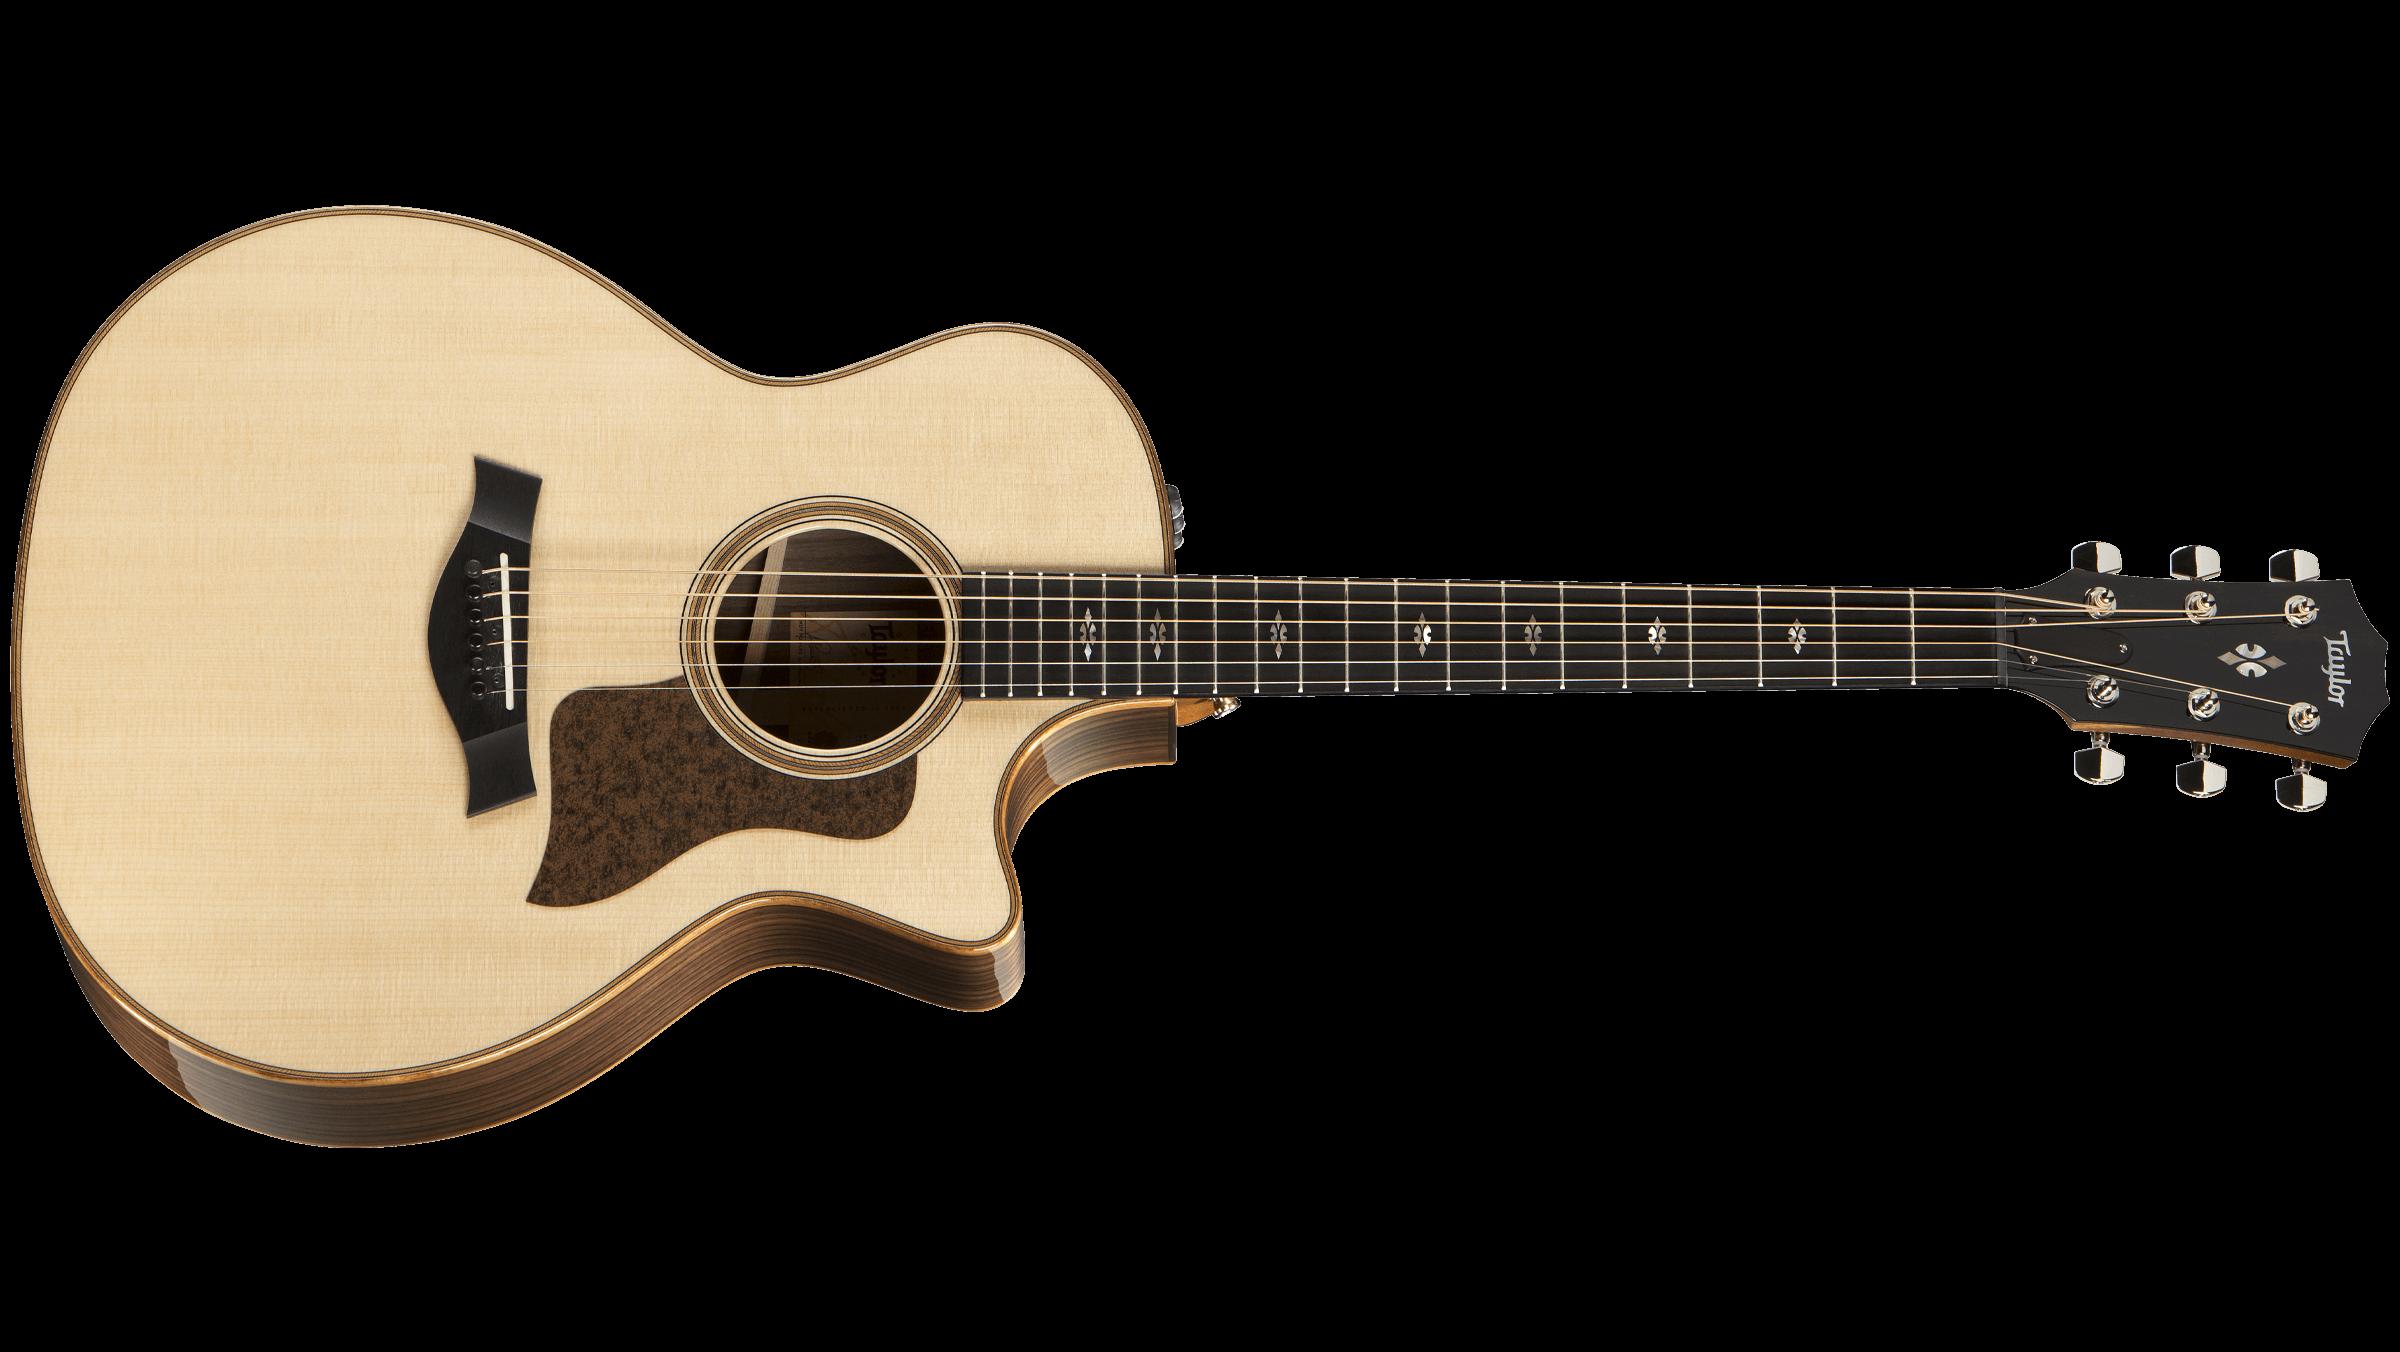 714ce Taylor Guitars